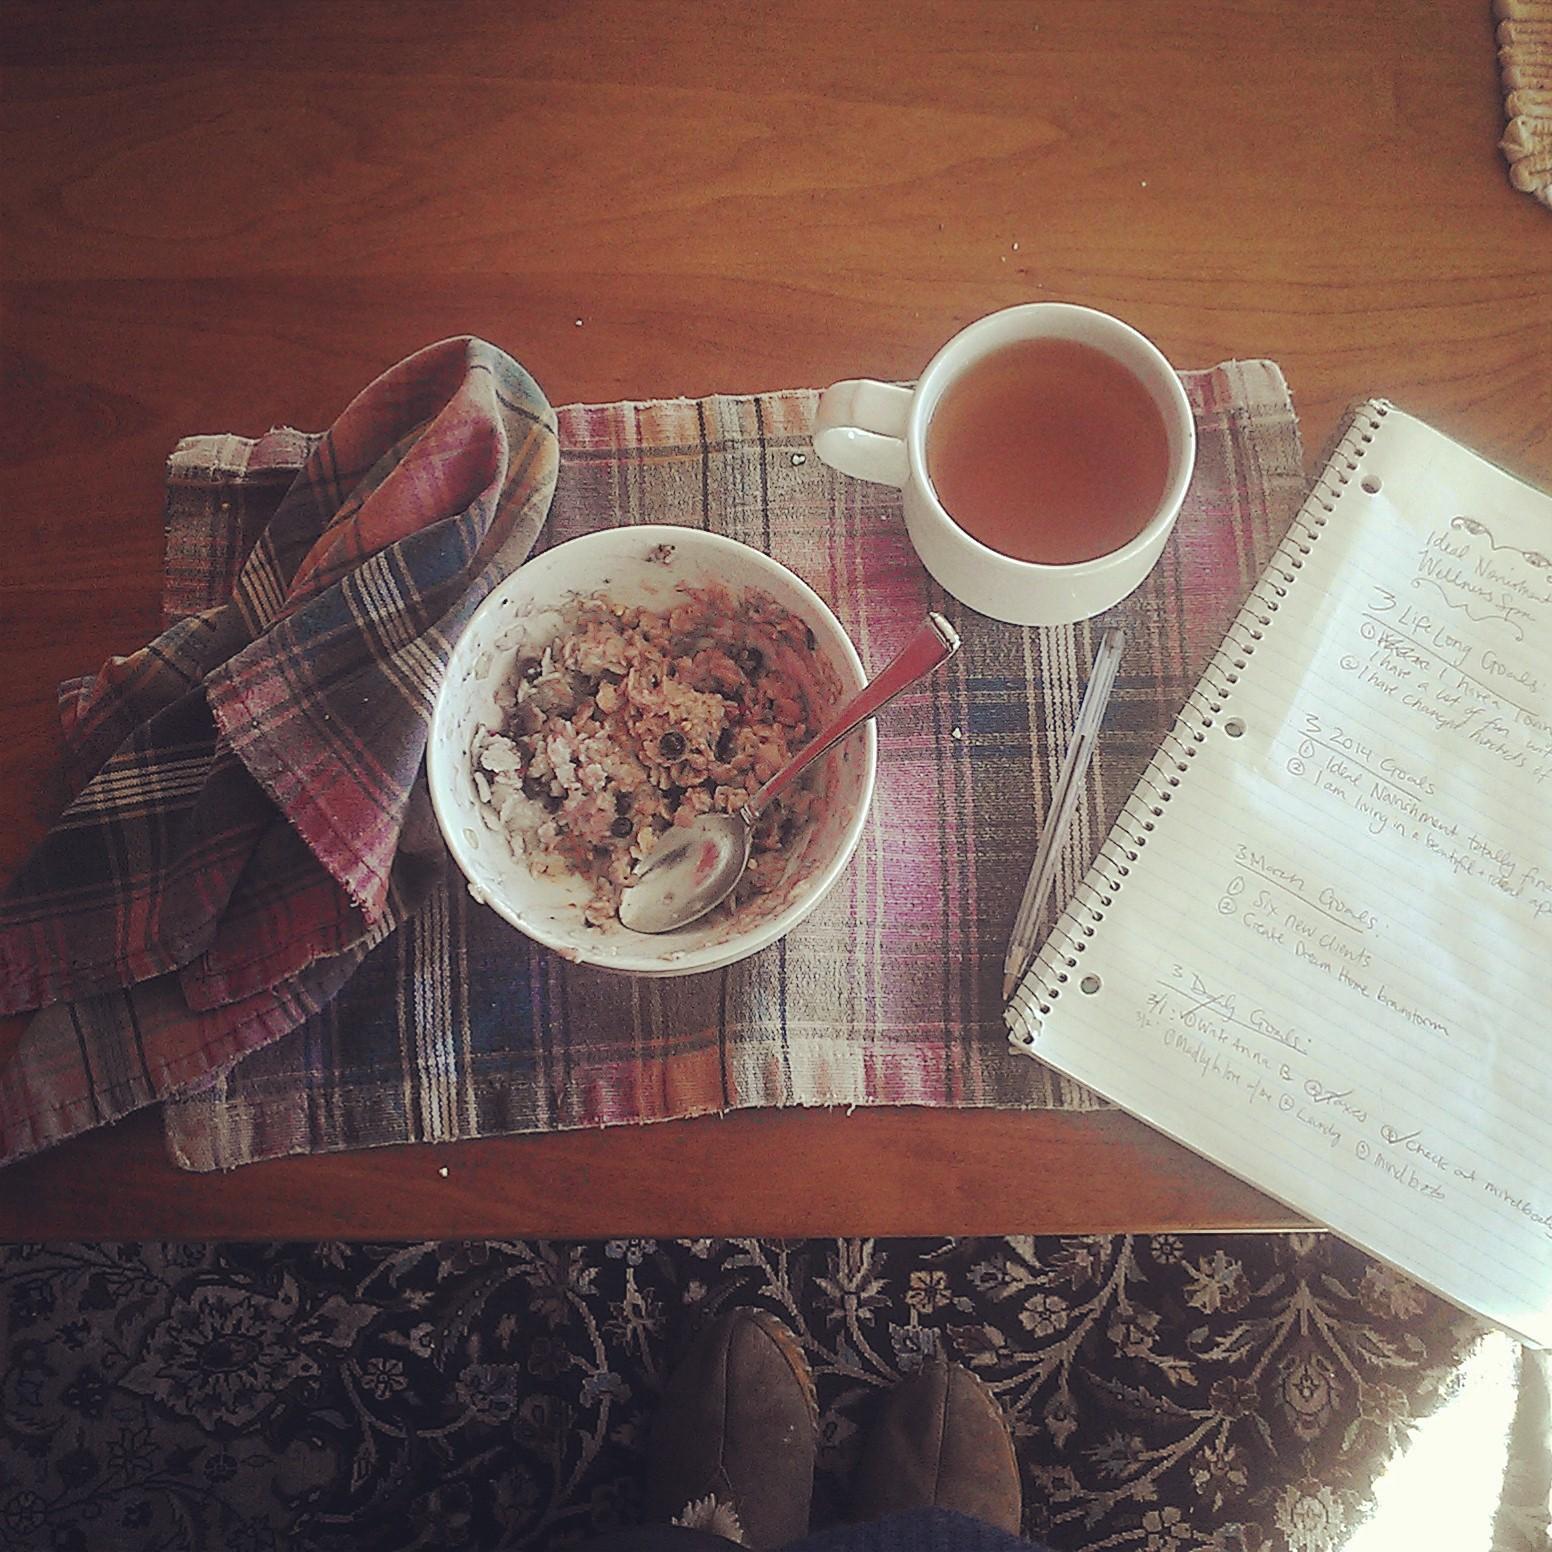 Muesli, tea and my notebook